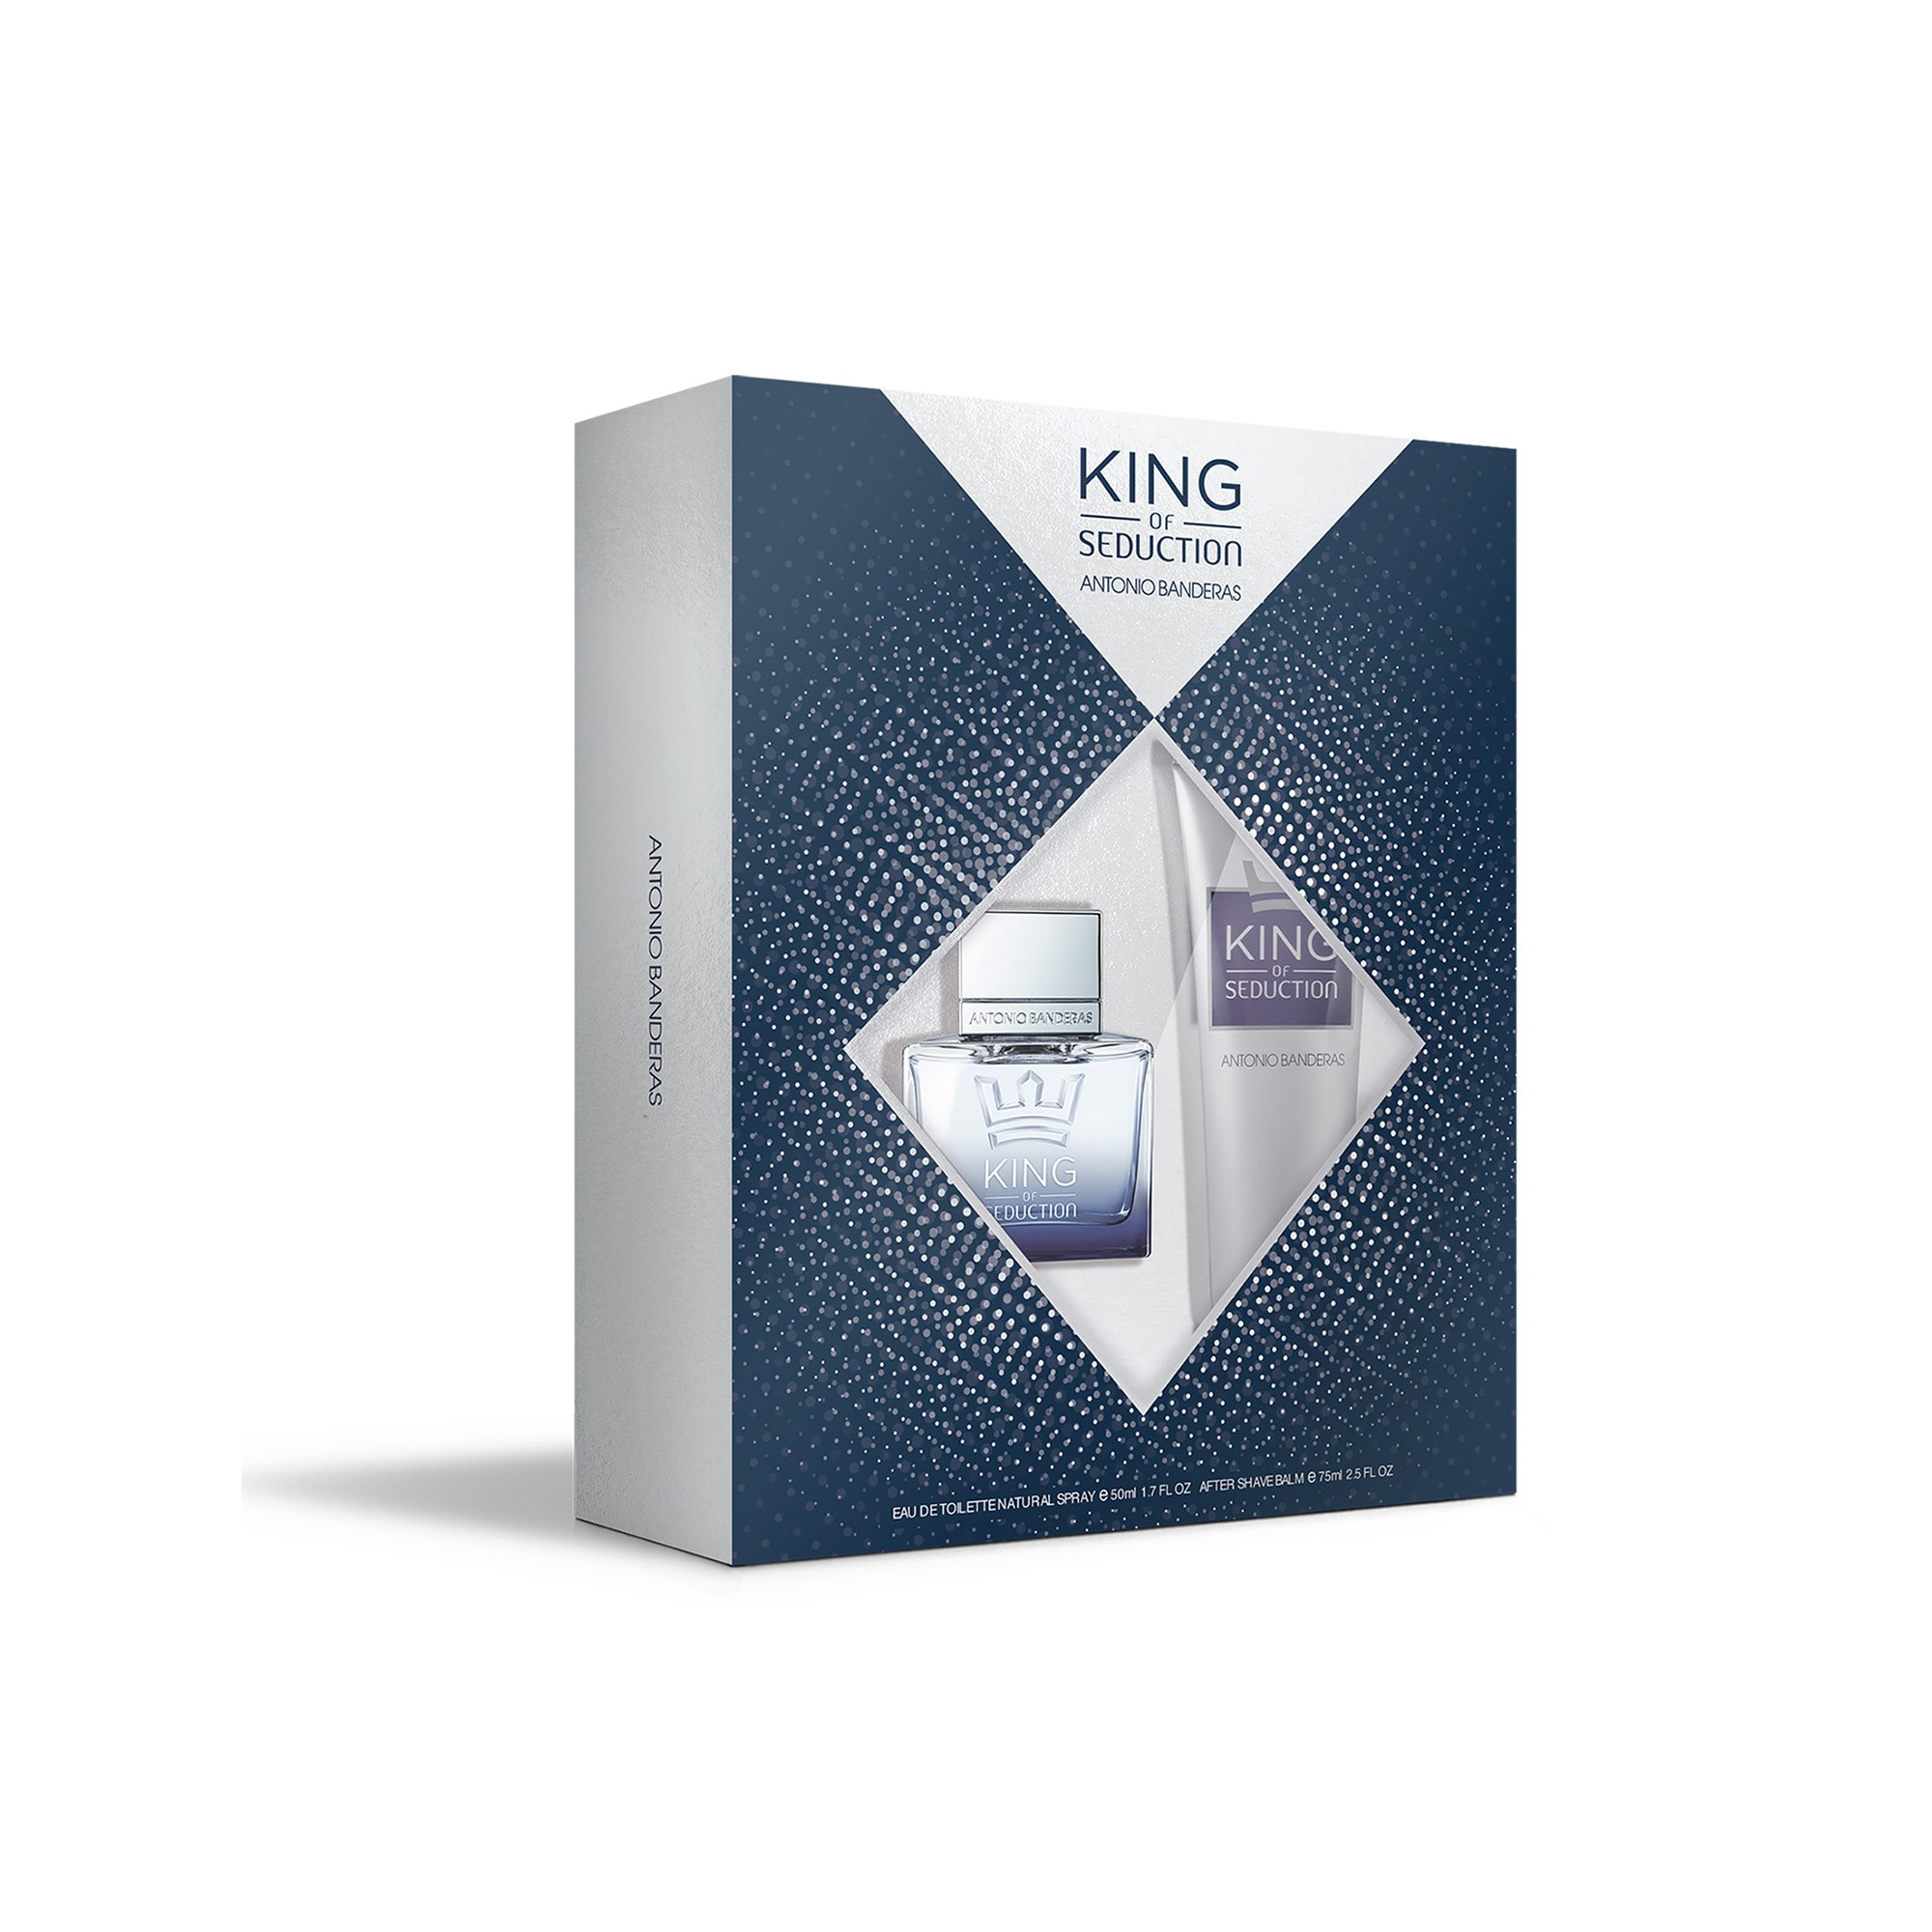 Perfume Antonio Banderas King Of Seduction Set Toilet Water 50 Ml + Balm